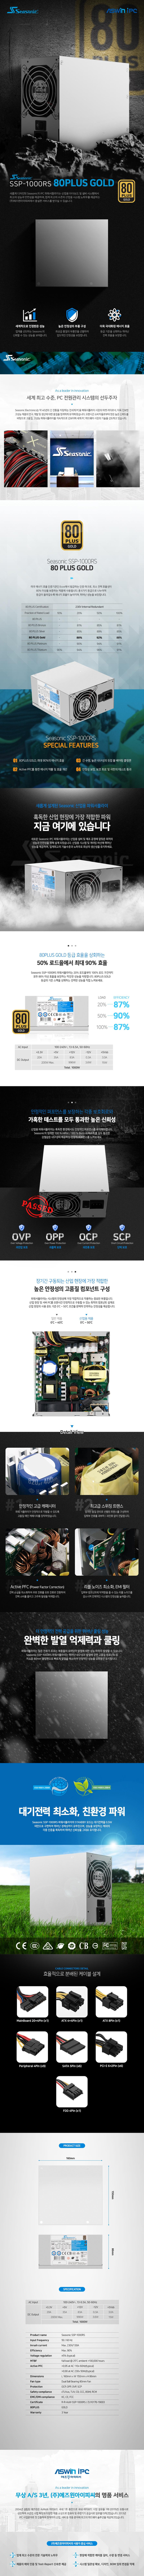 SSP-1000RS-1000W-80P_shop1_142810.jpg